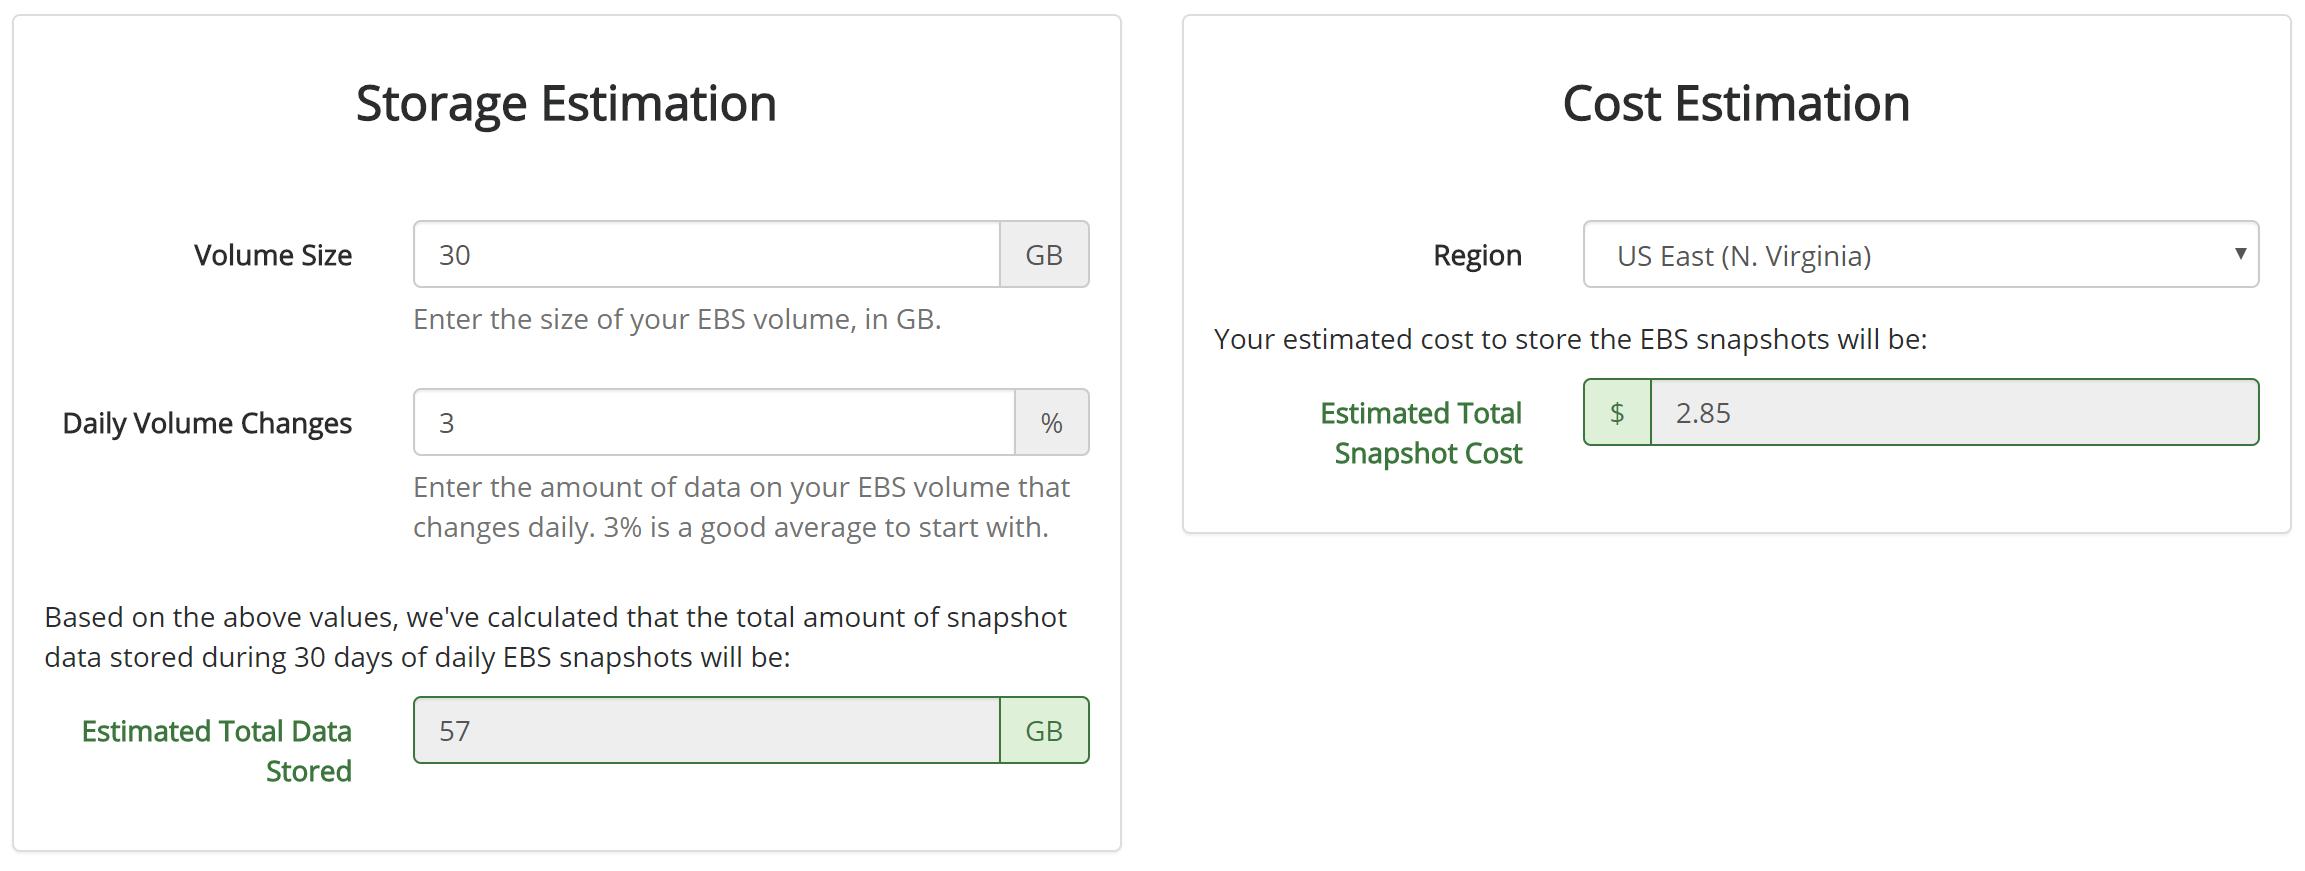 ebs snapshot cost calculator skeddly